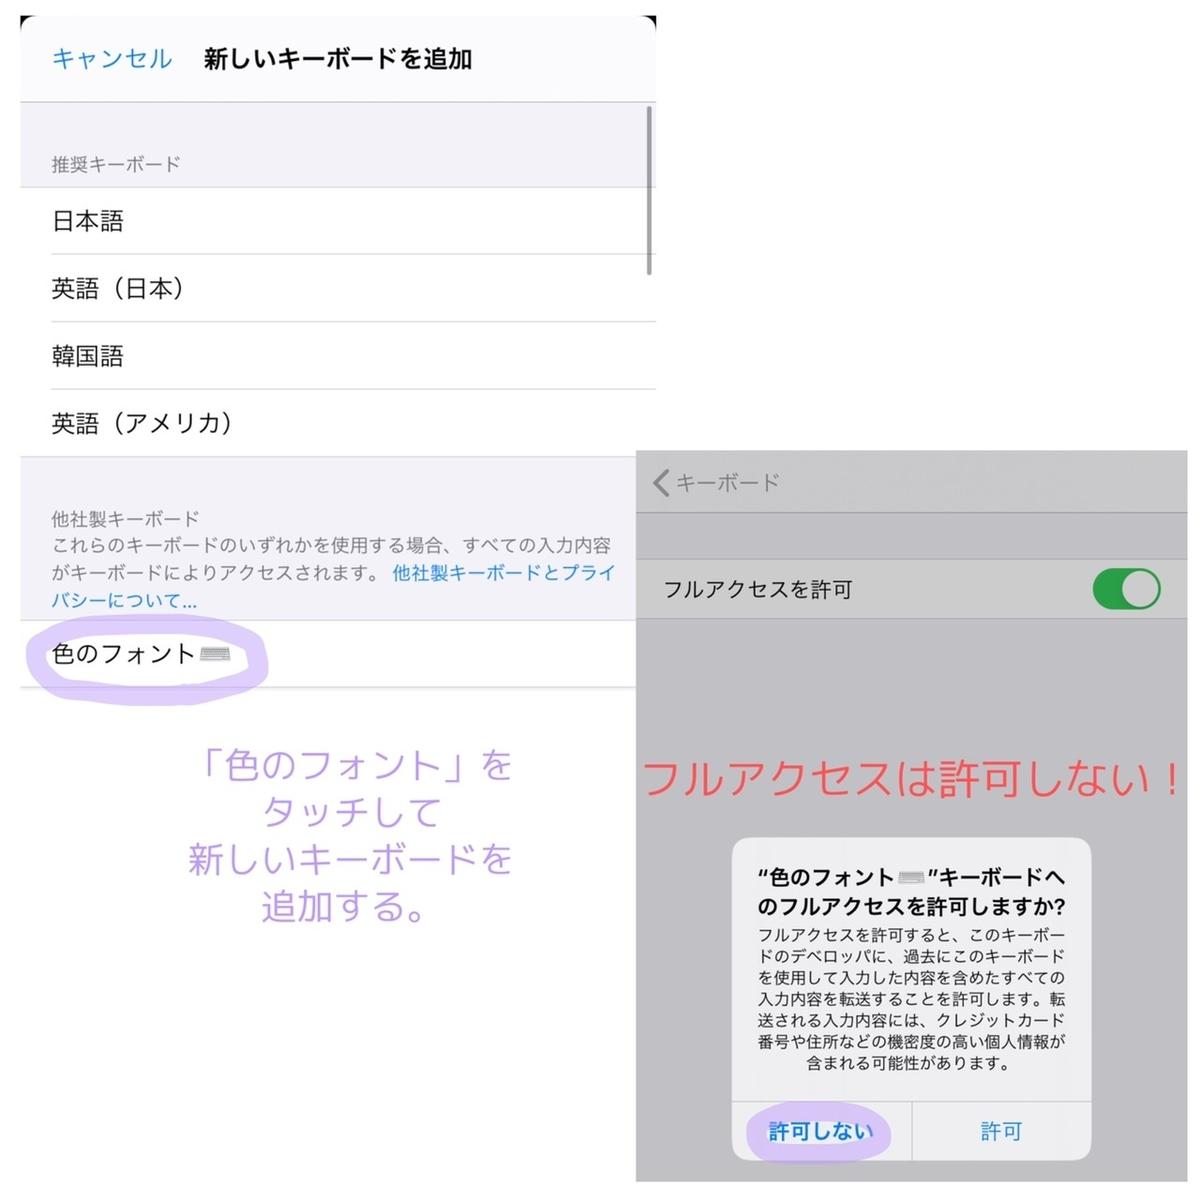 f:id:i-love-korea:20200911114651j:plain